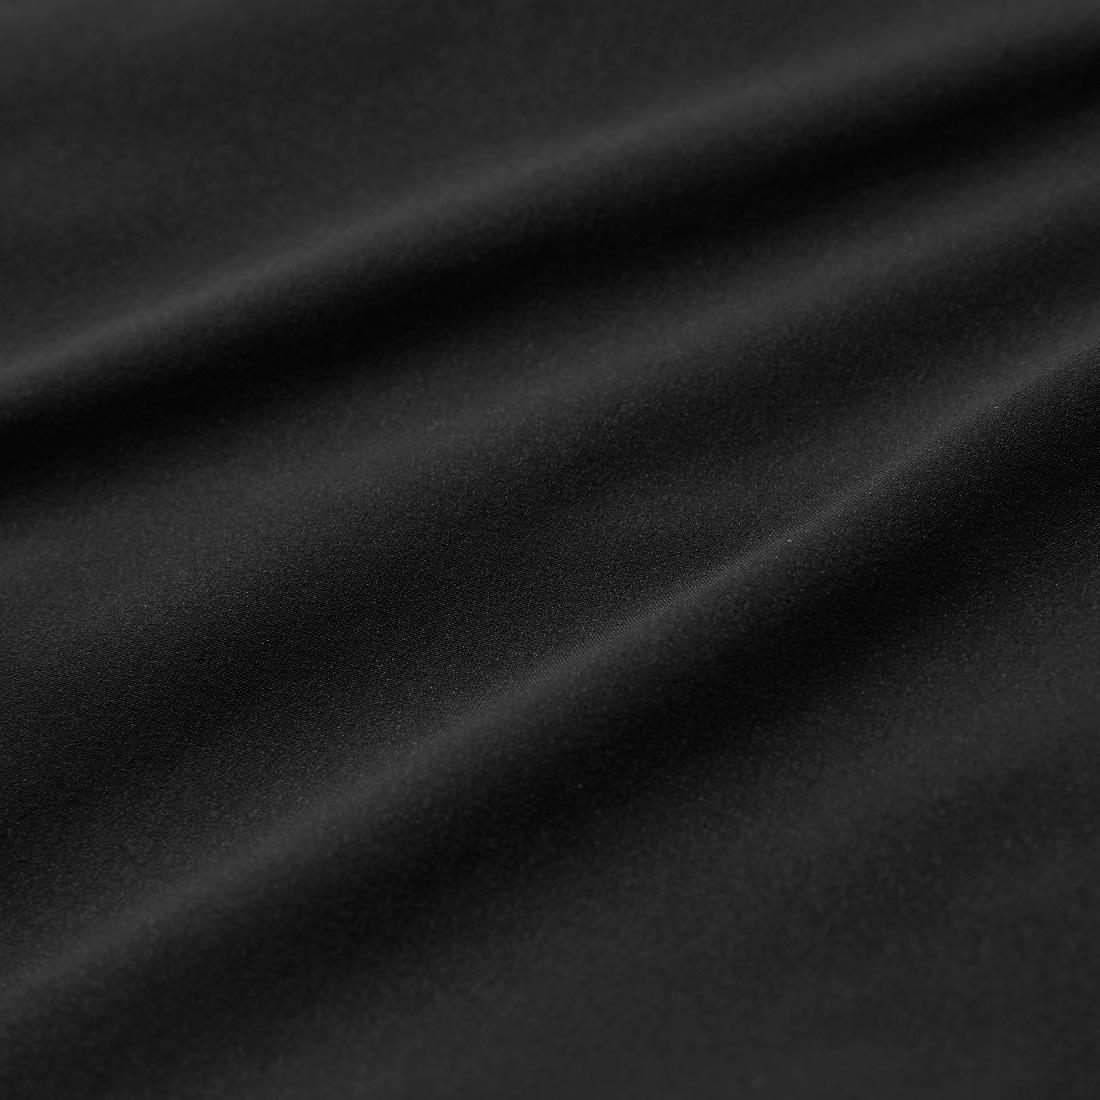 borderless no-collar jacket -male-の商品写真10